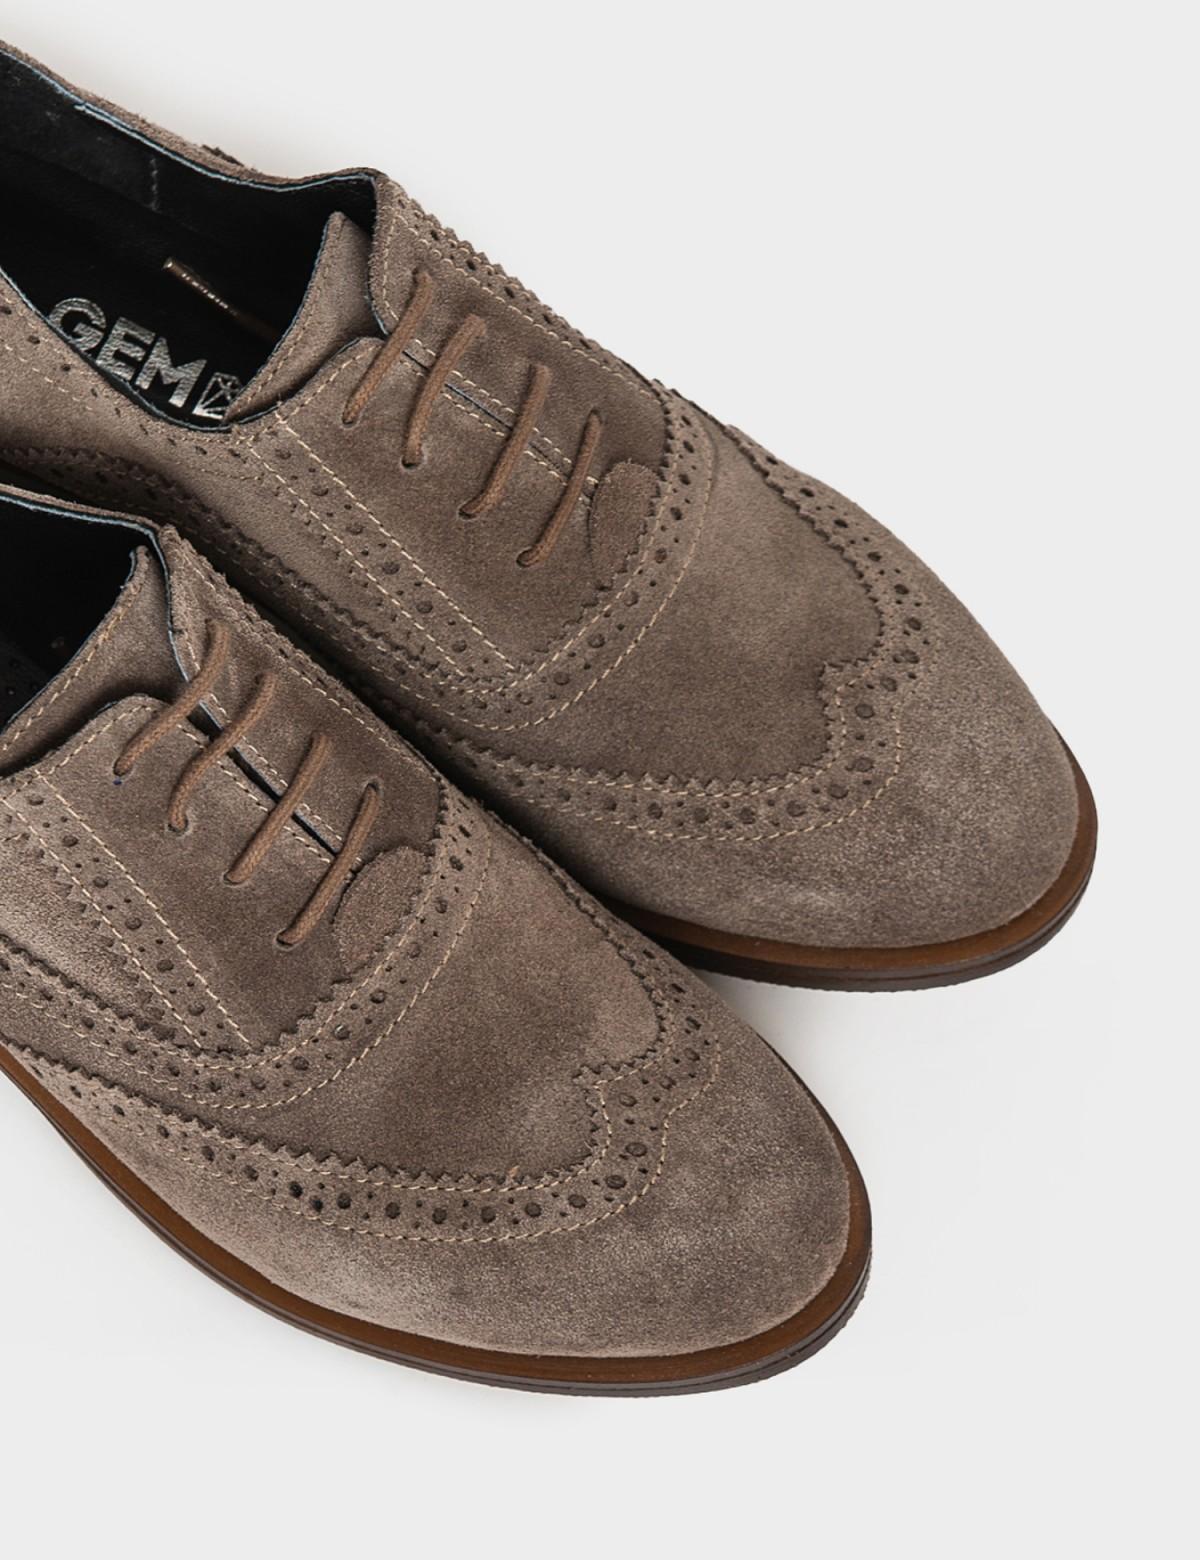 Туфли бежевые. Натуральная замша3